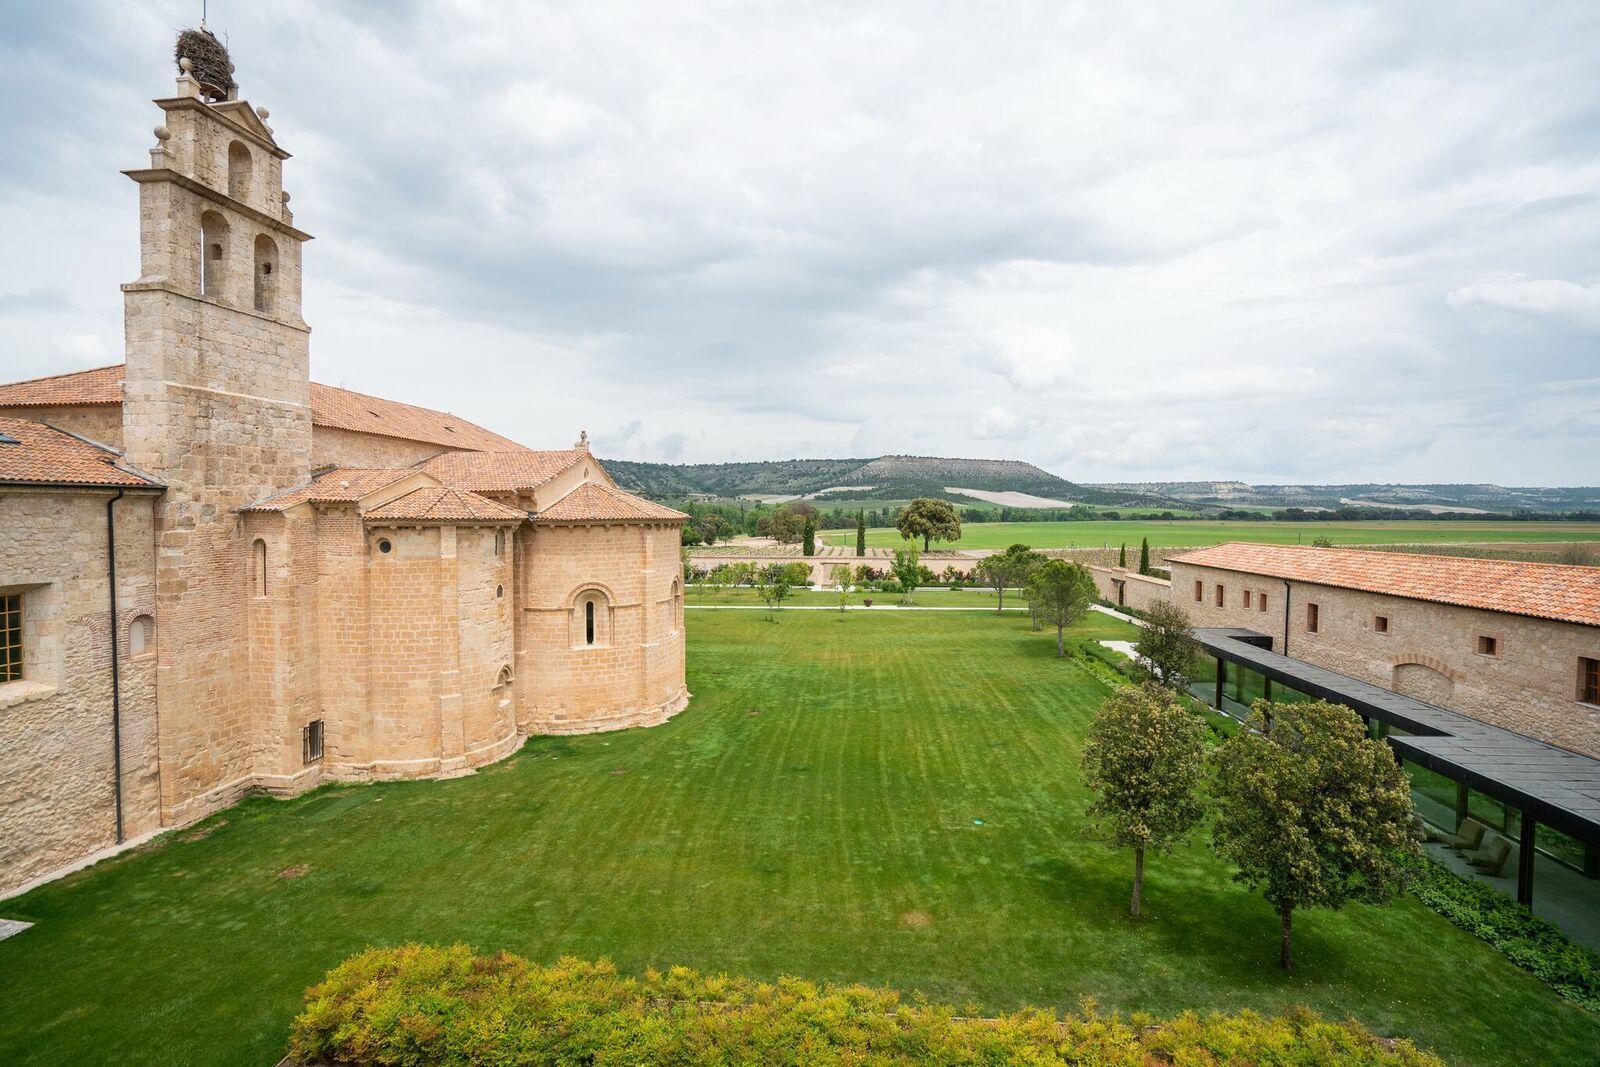 Abadía Retuerta Le Domaine.